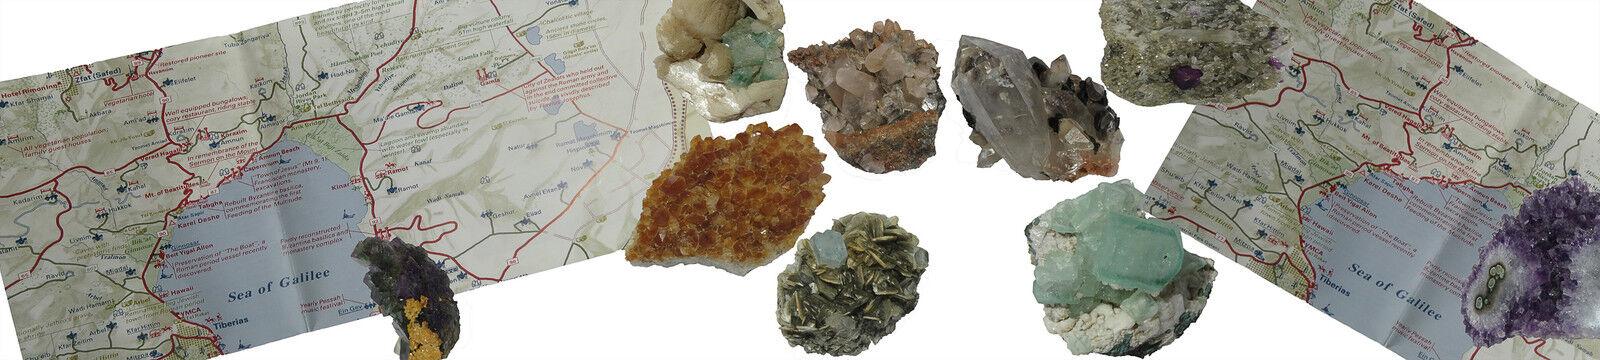 Galilee Gems